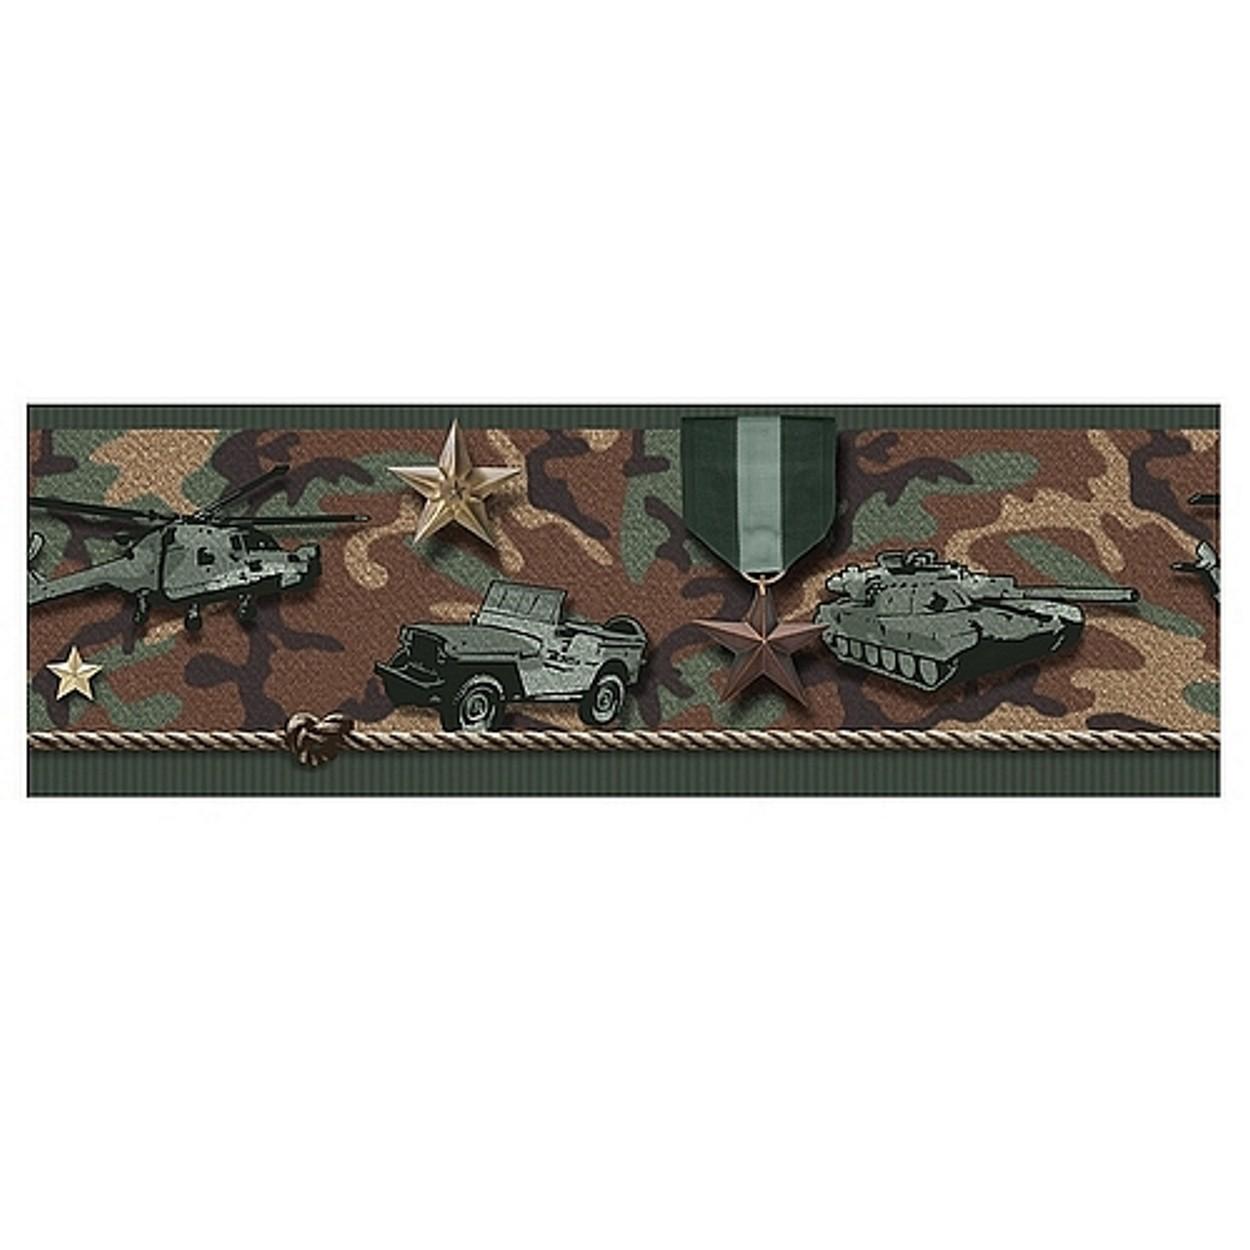 wars wallpapercom201302star wars border wallpaper1234122html 1250x1250